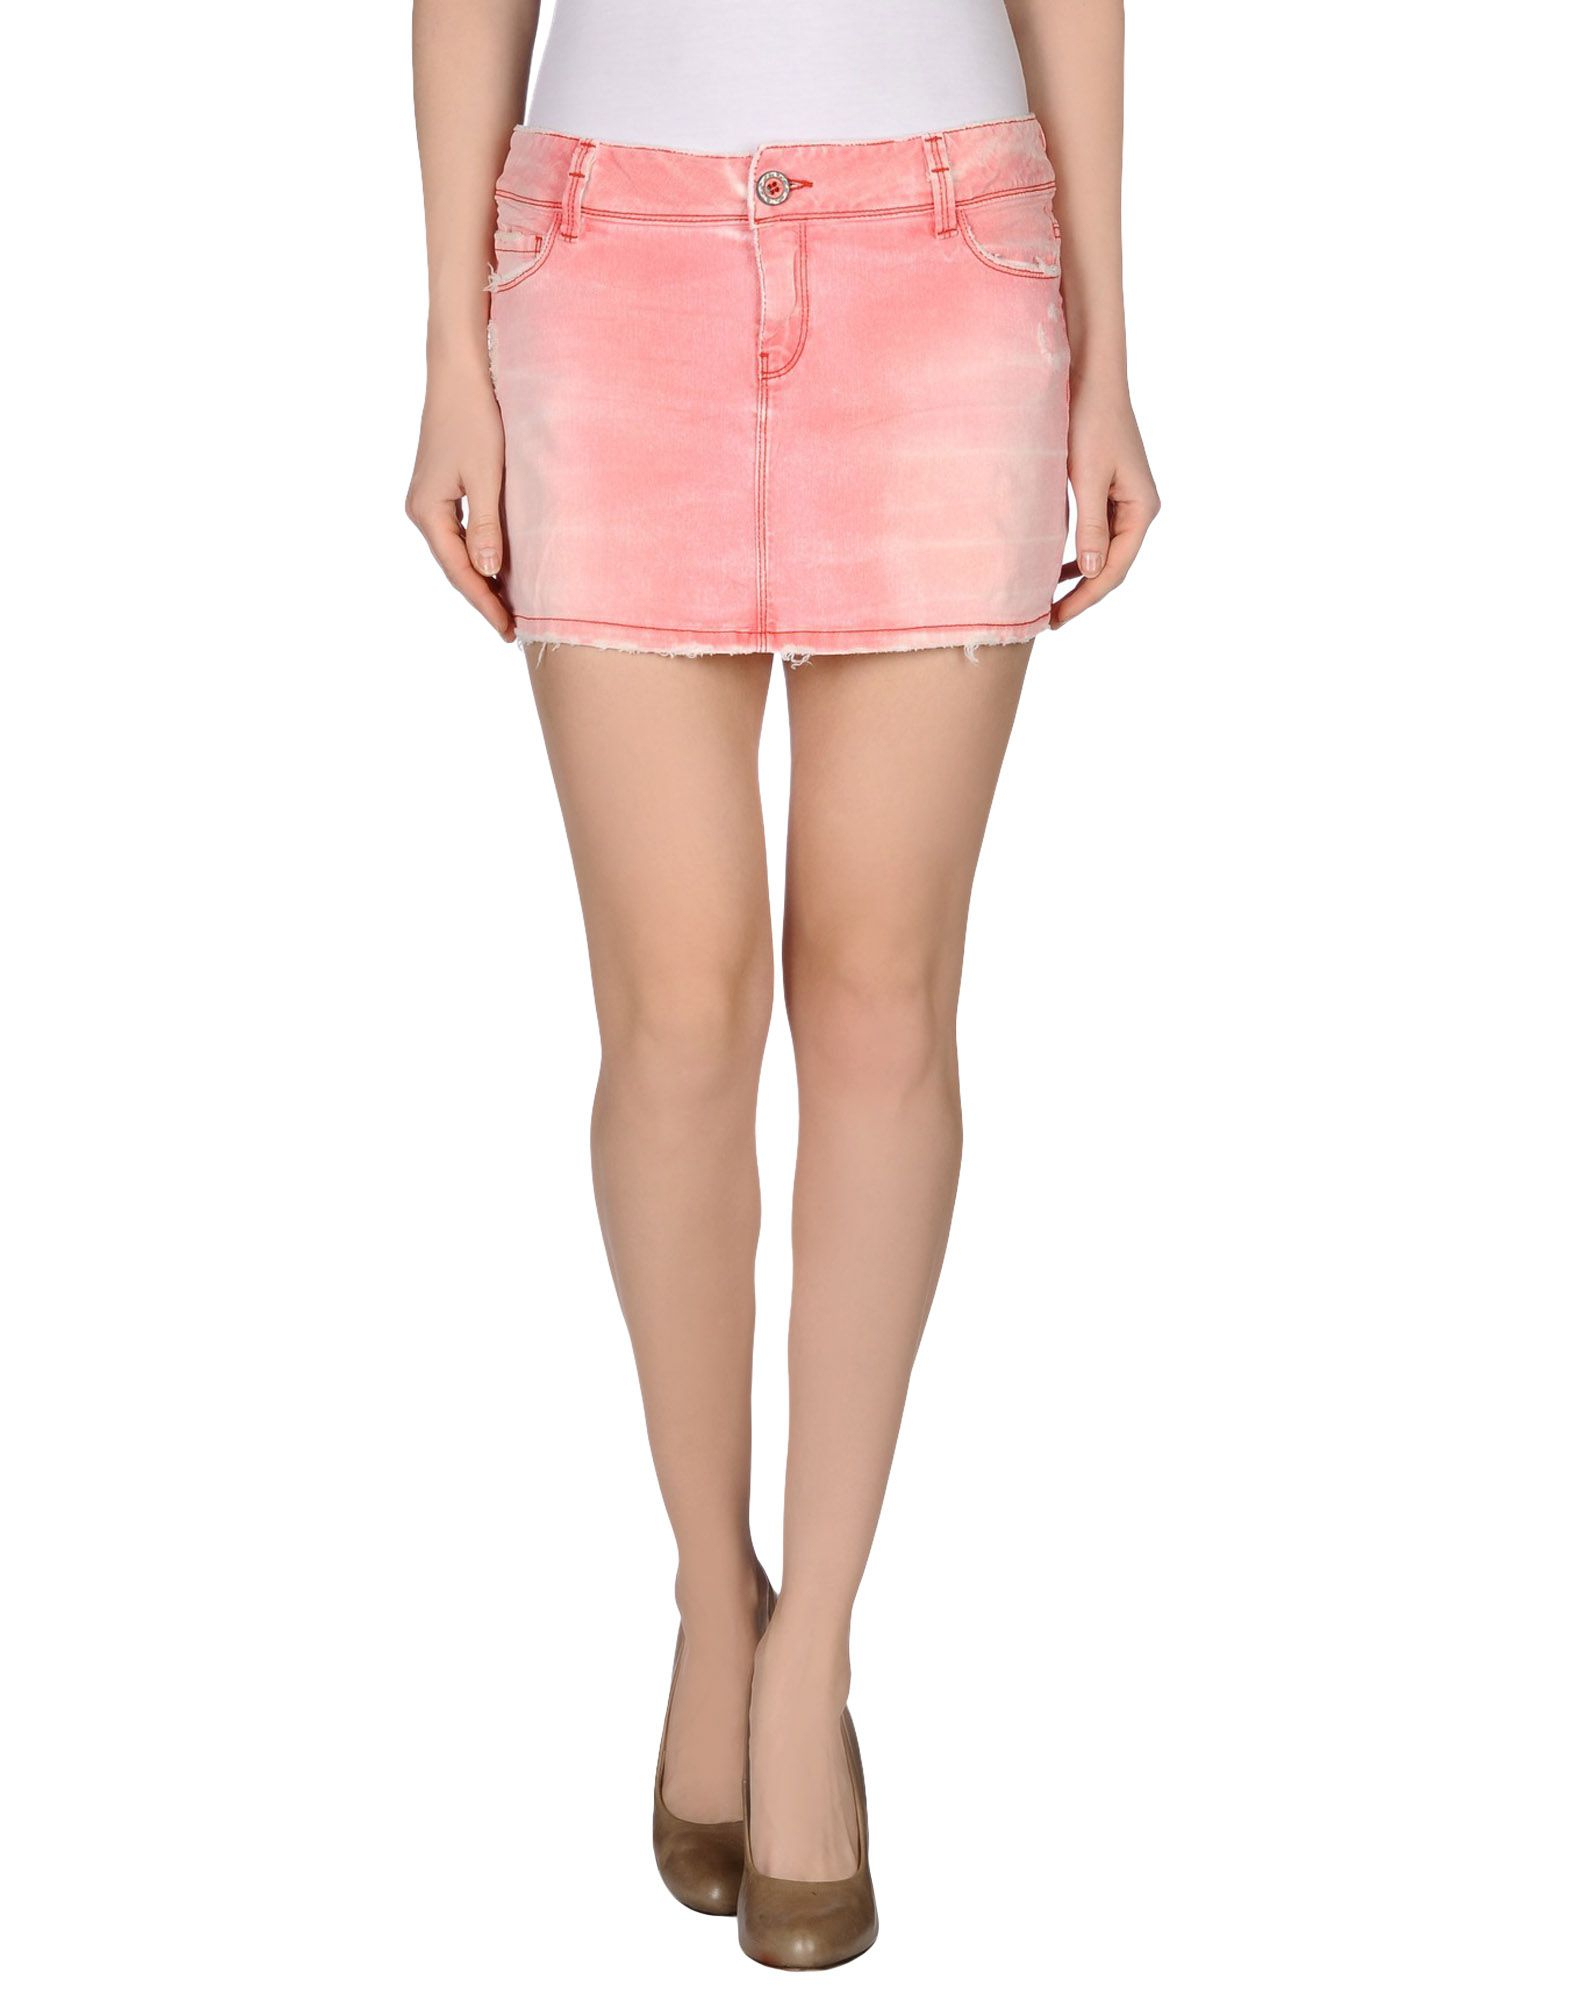 jfour denim skirt in pink coral save 80 lyst